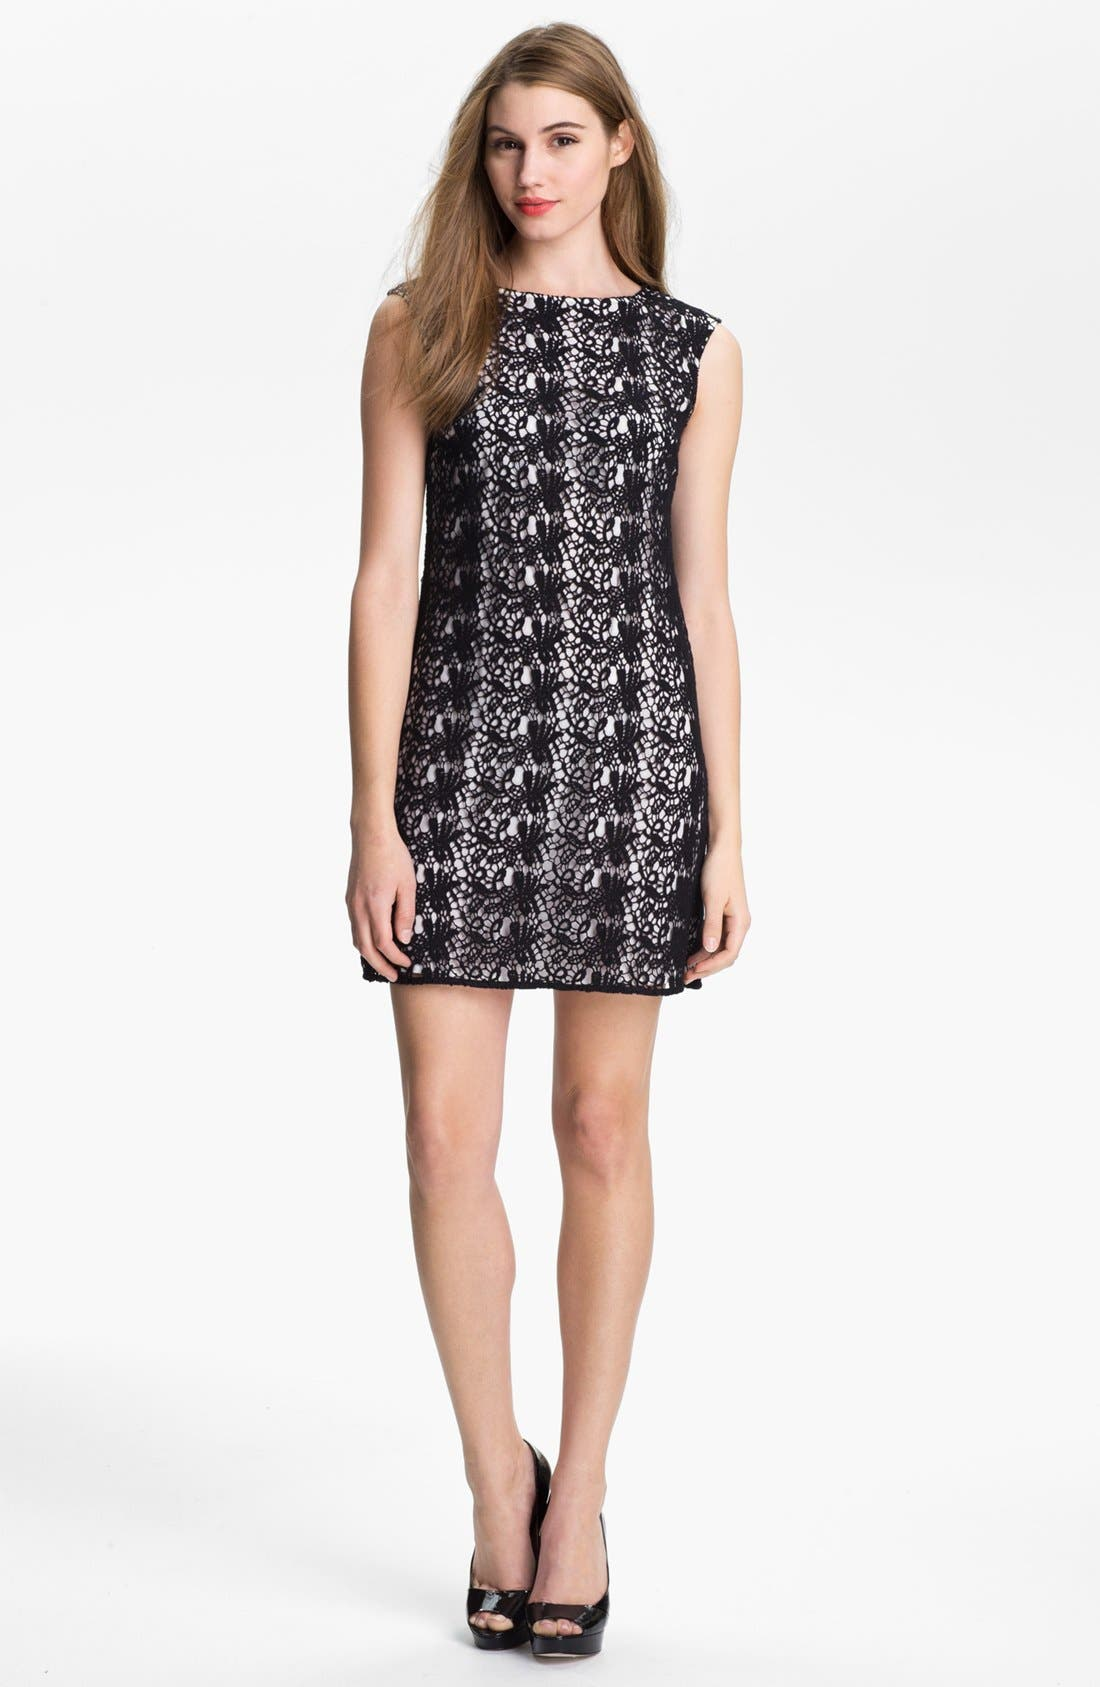 Alternate Image 1 Selected - Vince Camuto Paisley Lace Shift Dress (Petite)